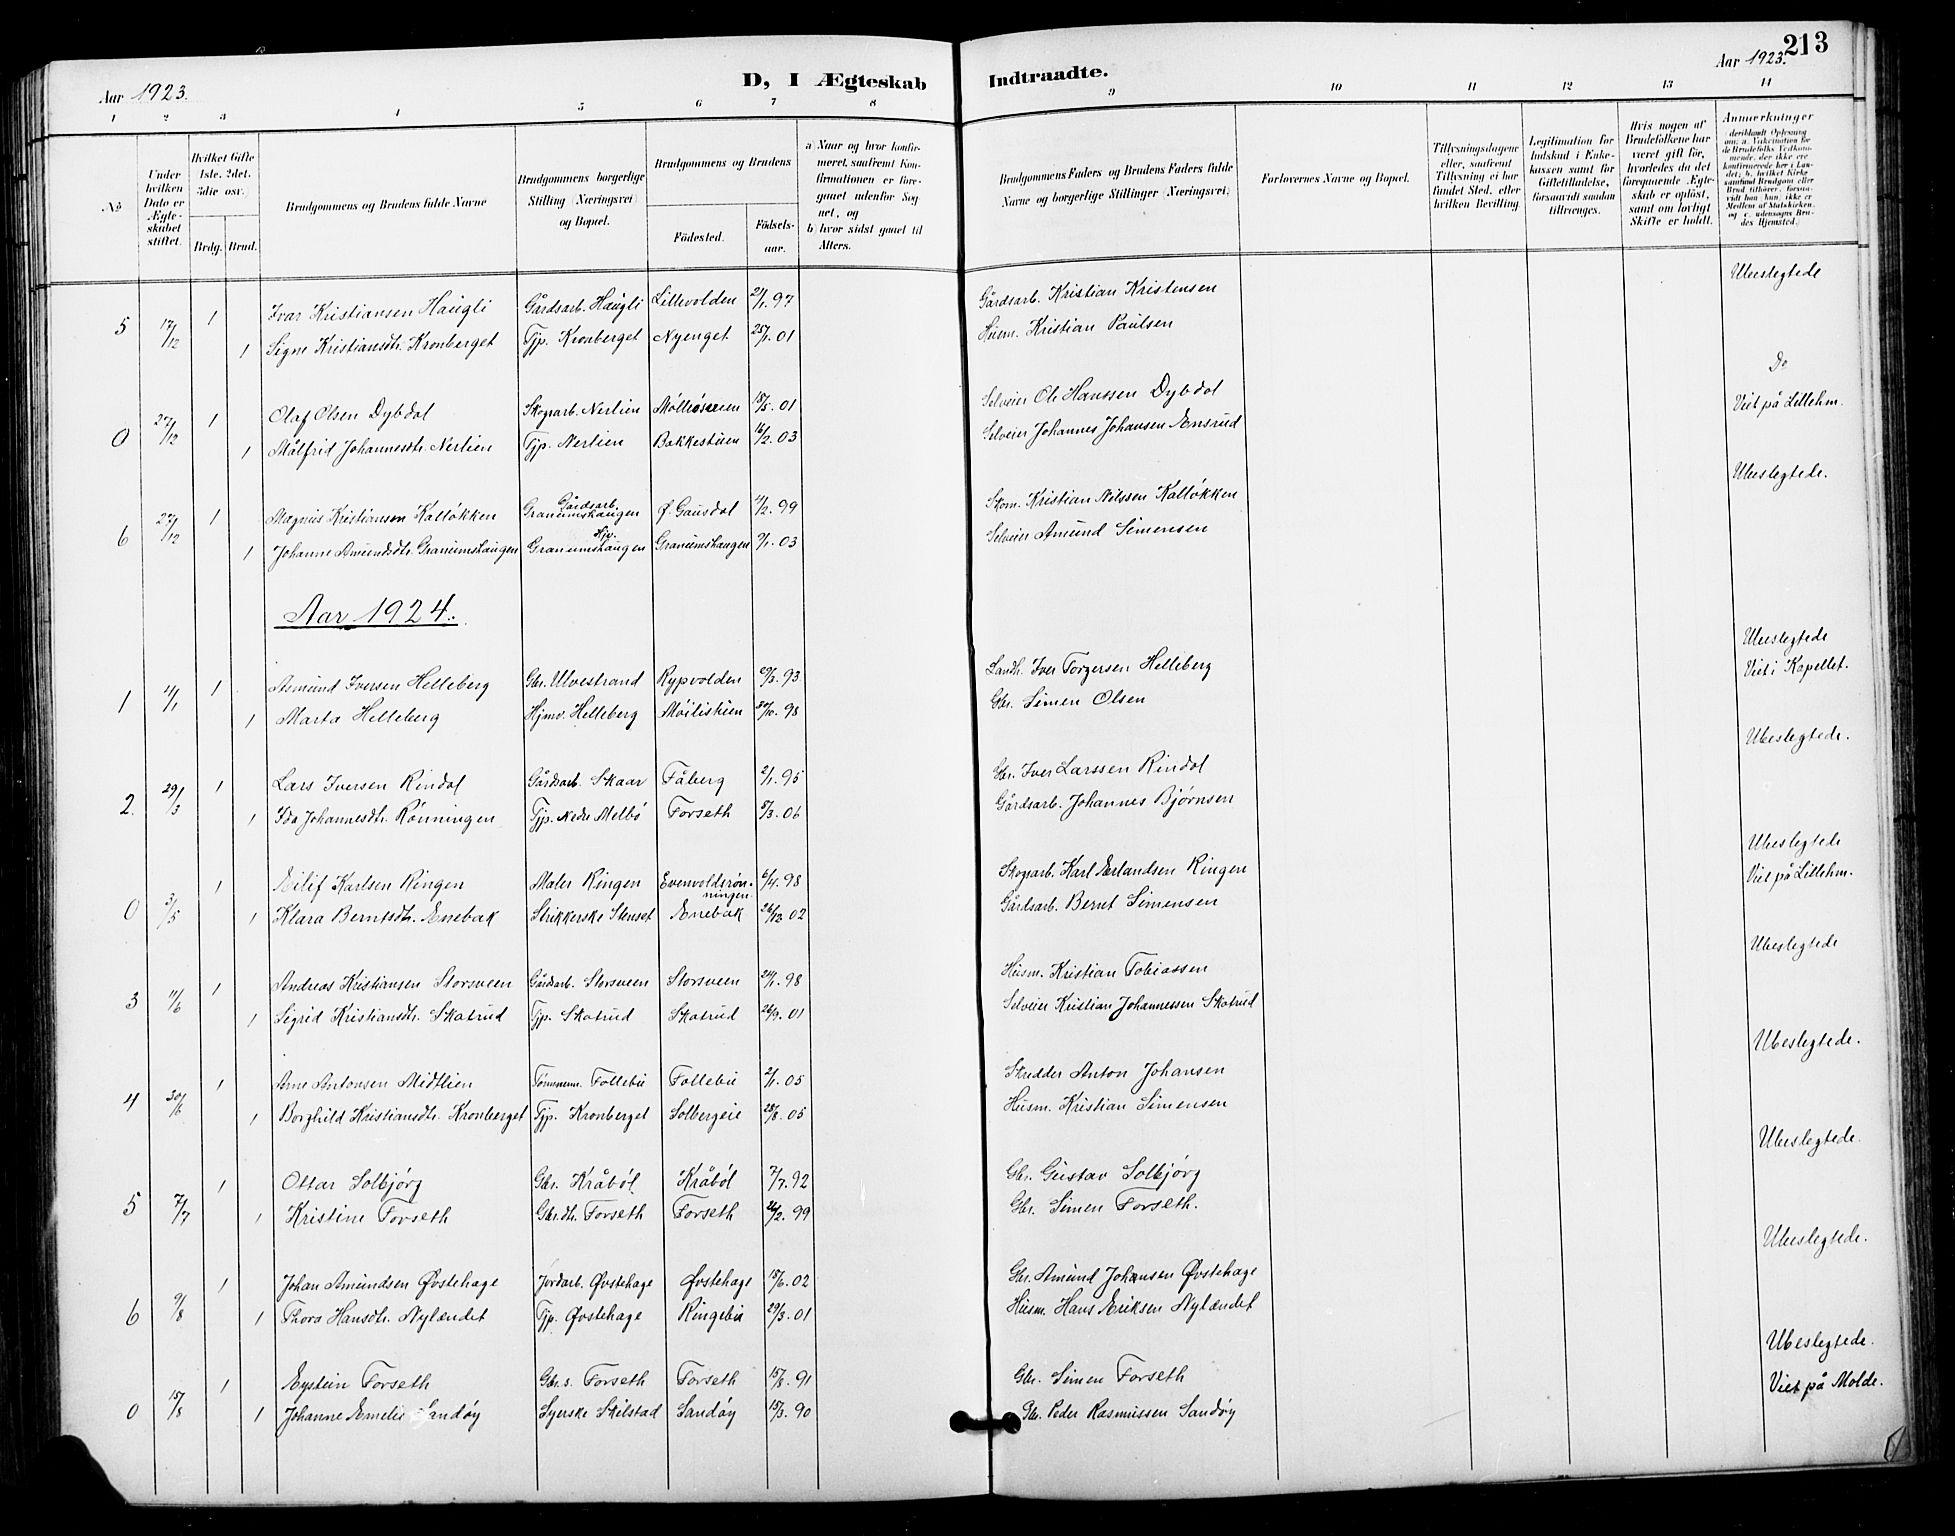 SAH, Vestre Gausdal prestekontor, Klokkerbok nr. 3, 1896-1925, s. 213